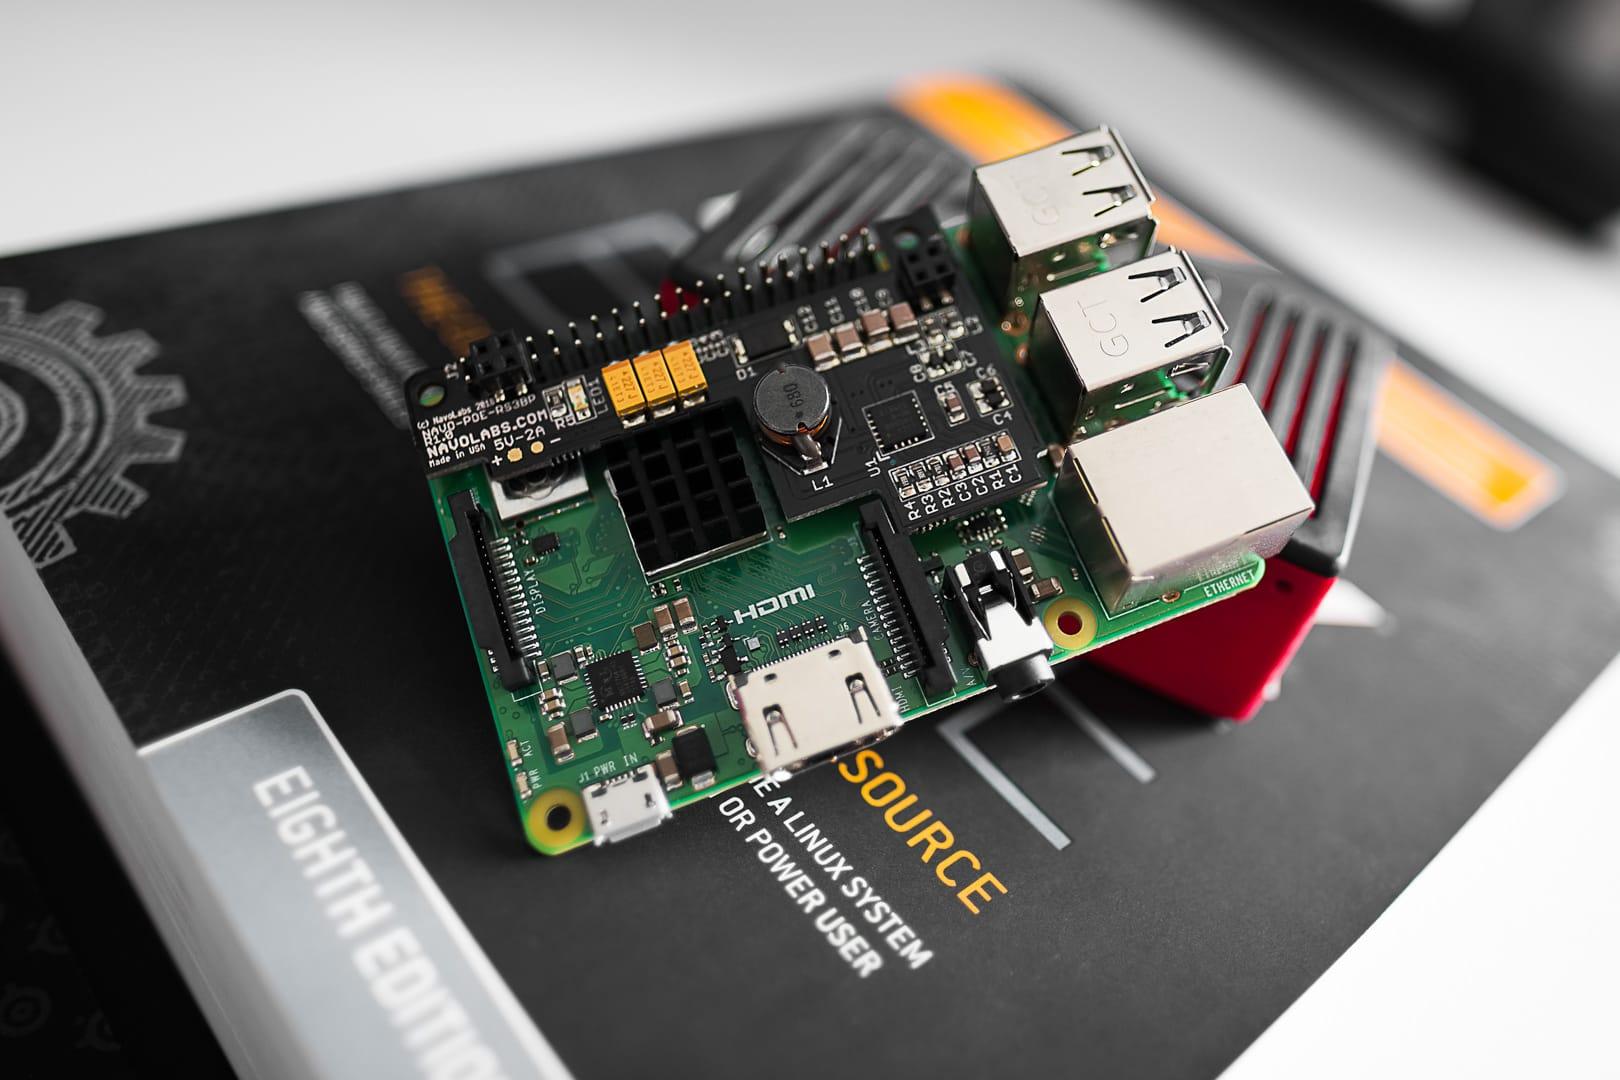 Homelab: Raspberry Pi and Pi-hole – Marthur